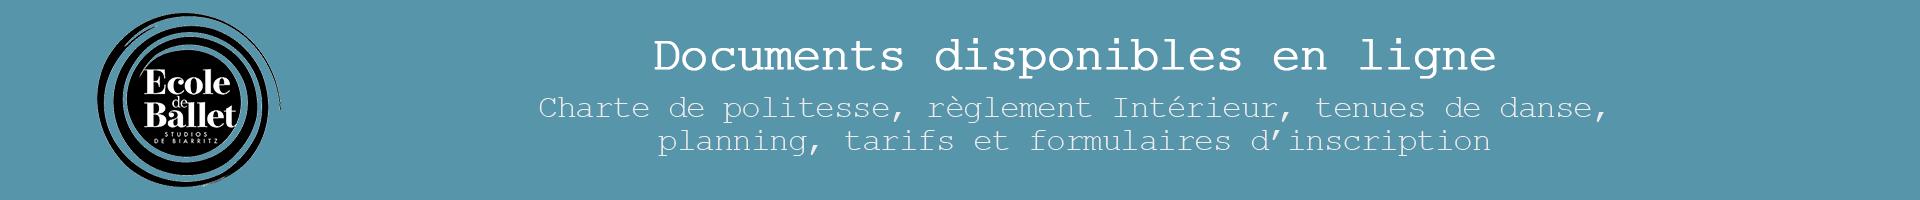 Ecole de Ballet Studios de Biarritz Banner documents en ligne